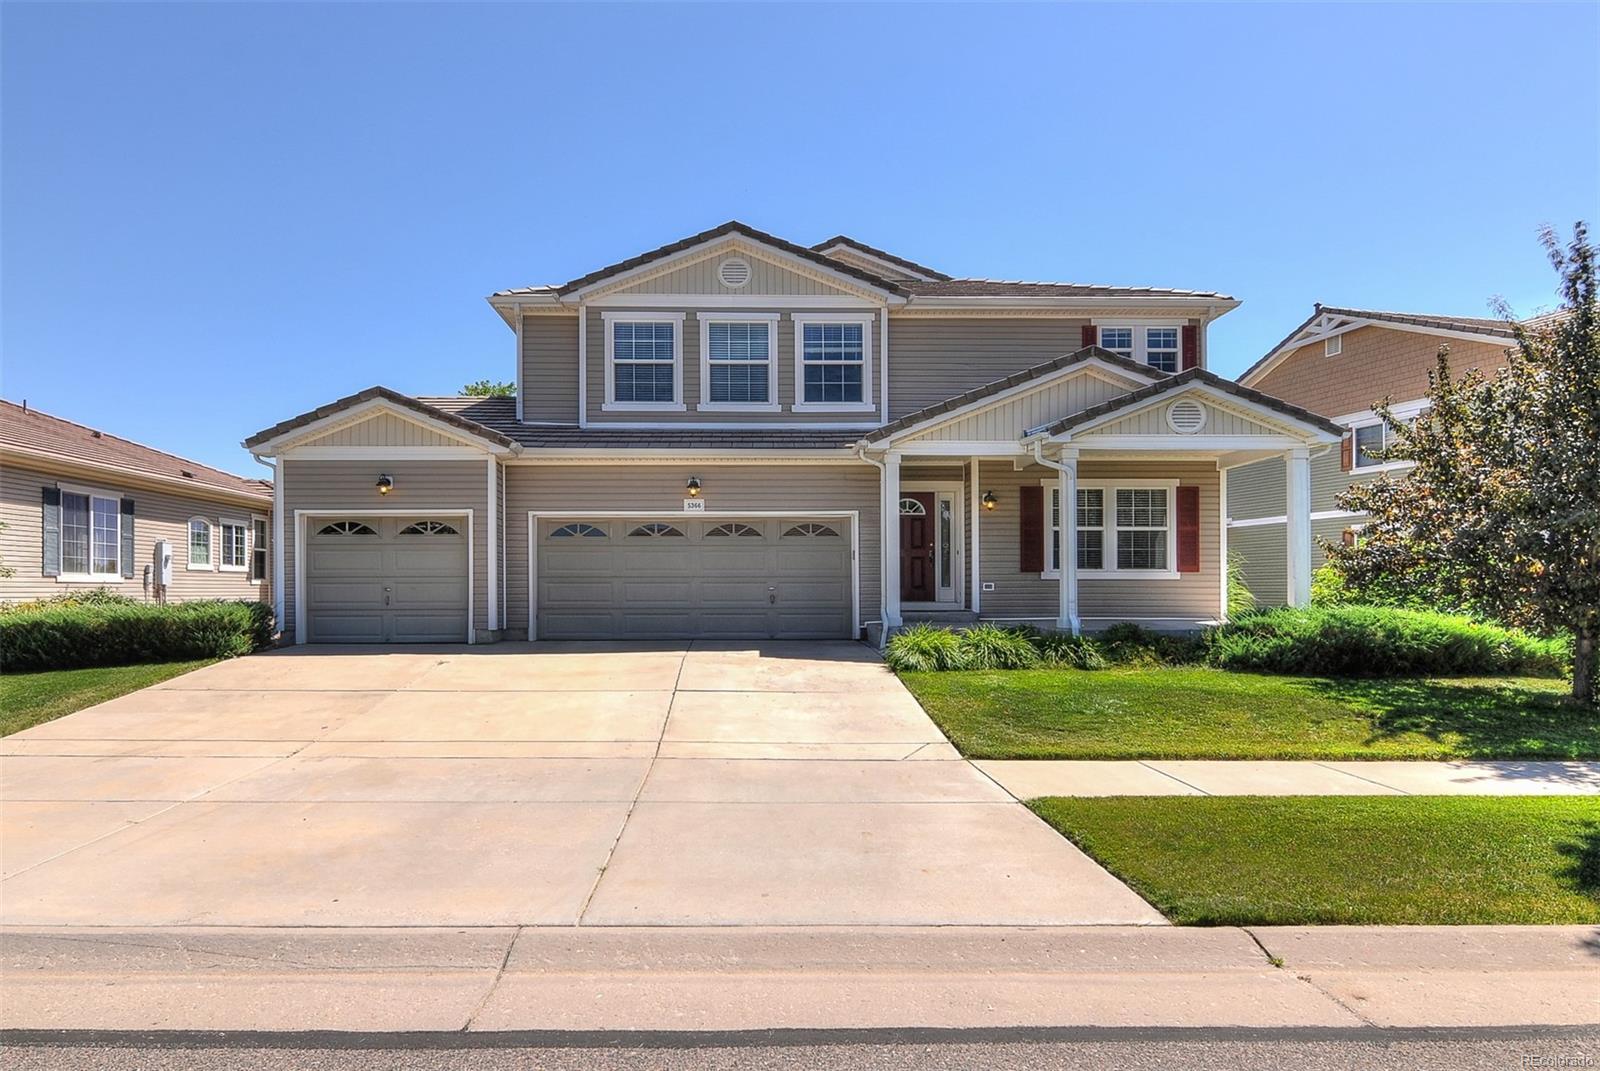 5366 Malta Street, Denver, CO 80249 - Denver, CO real estate listing